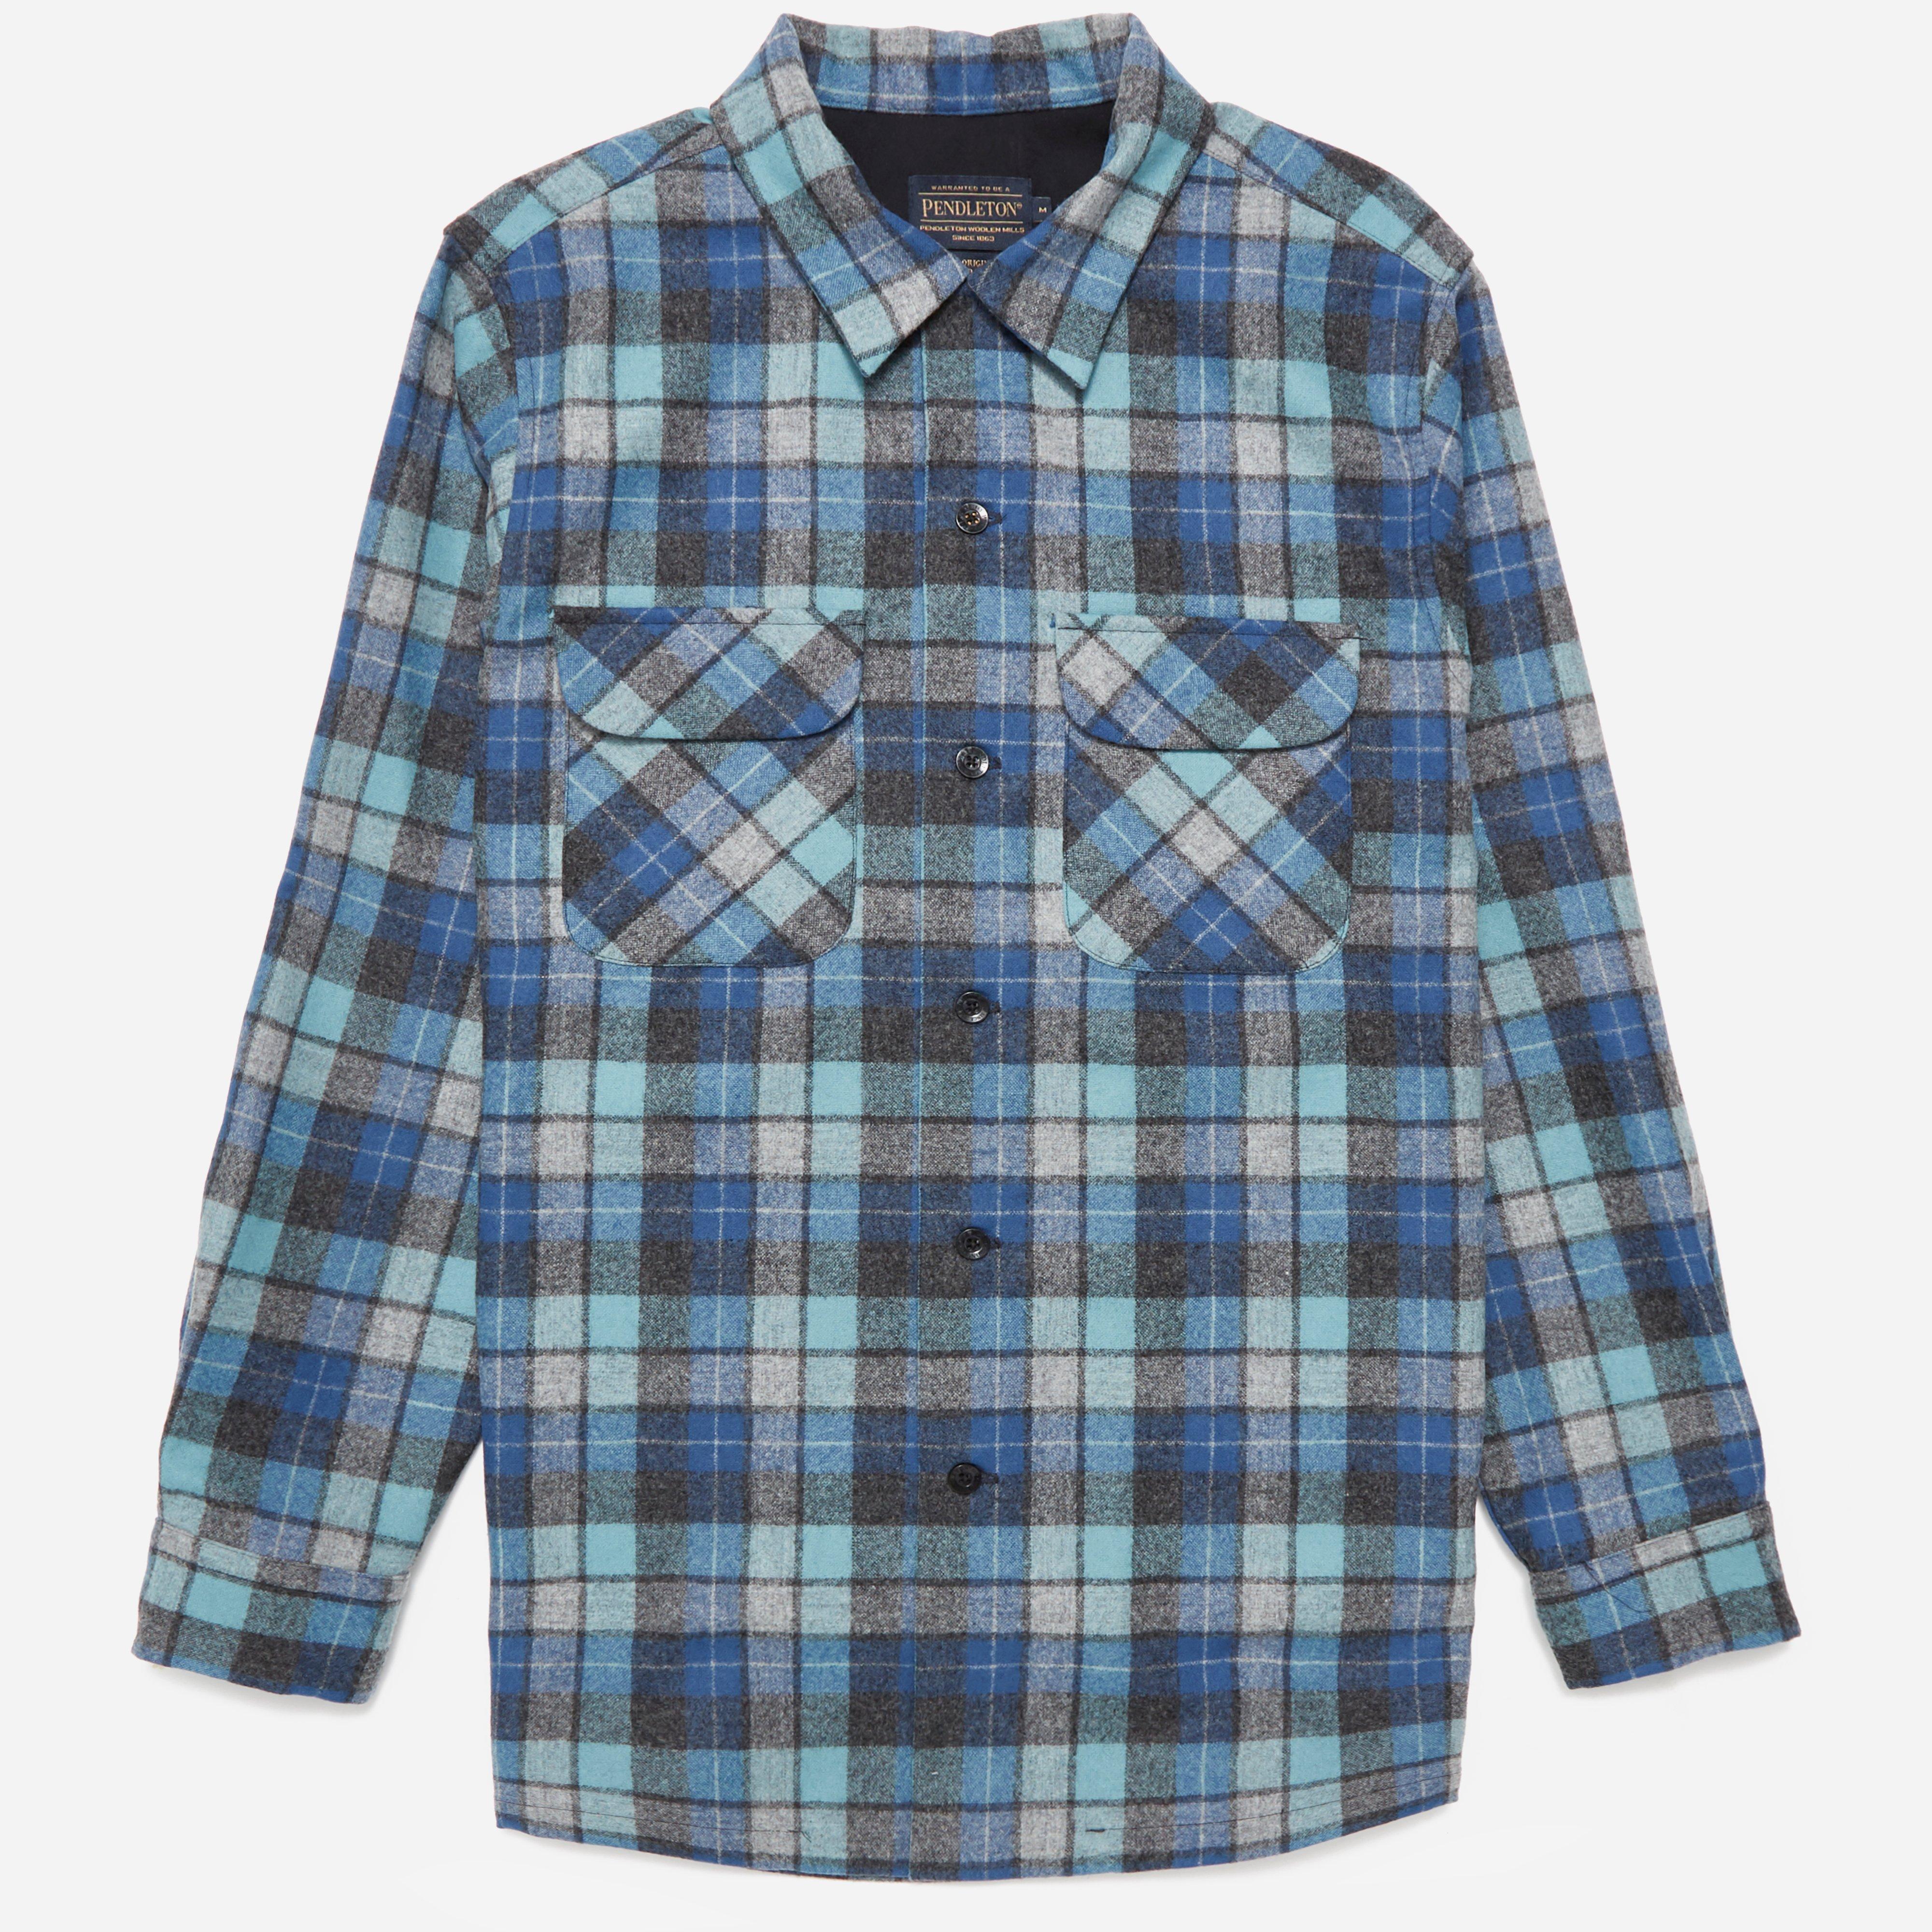 Pendleton Woolen Mills Board Shirt